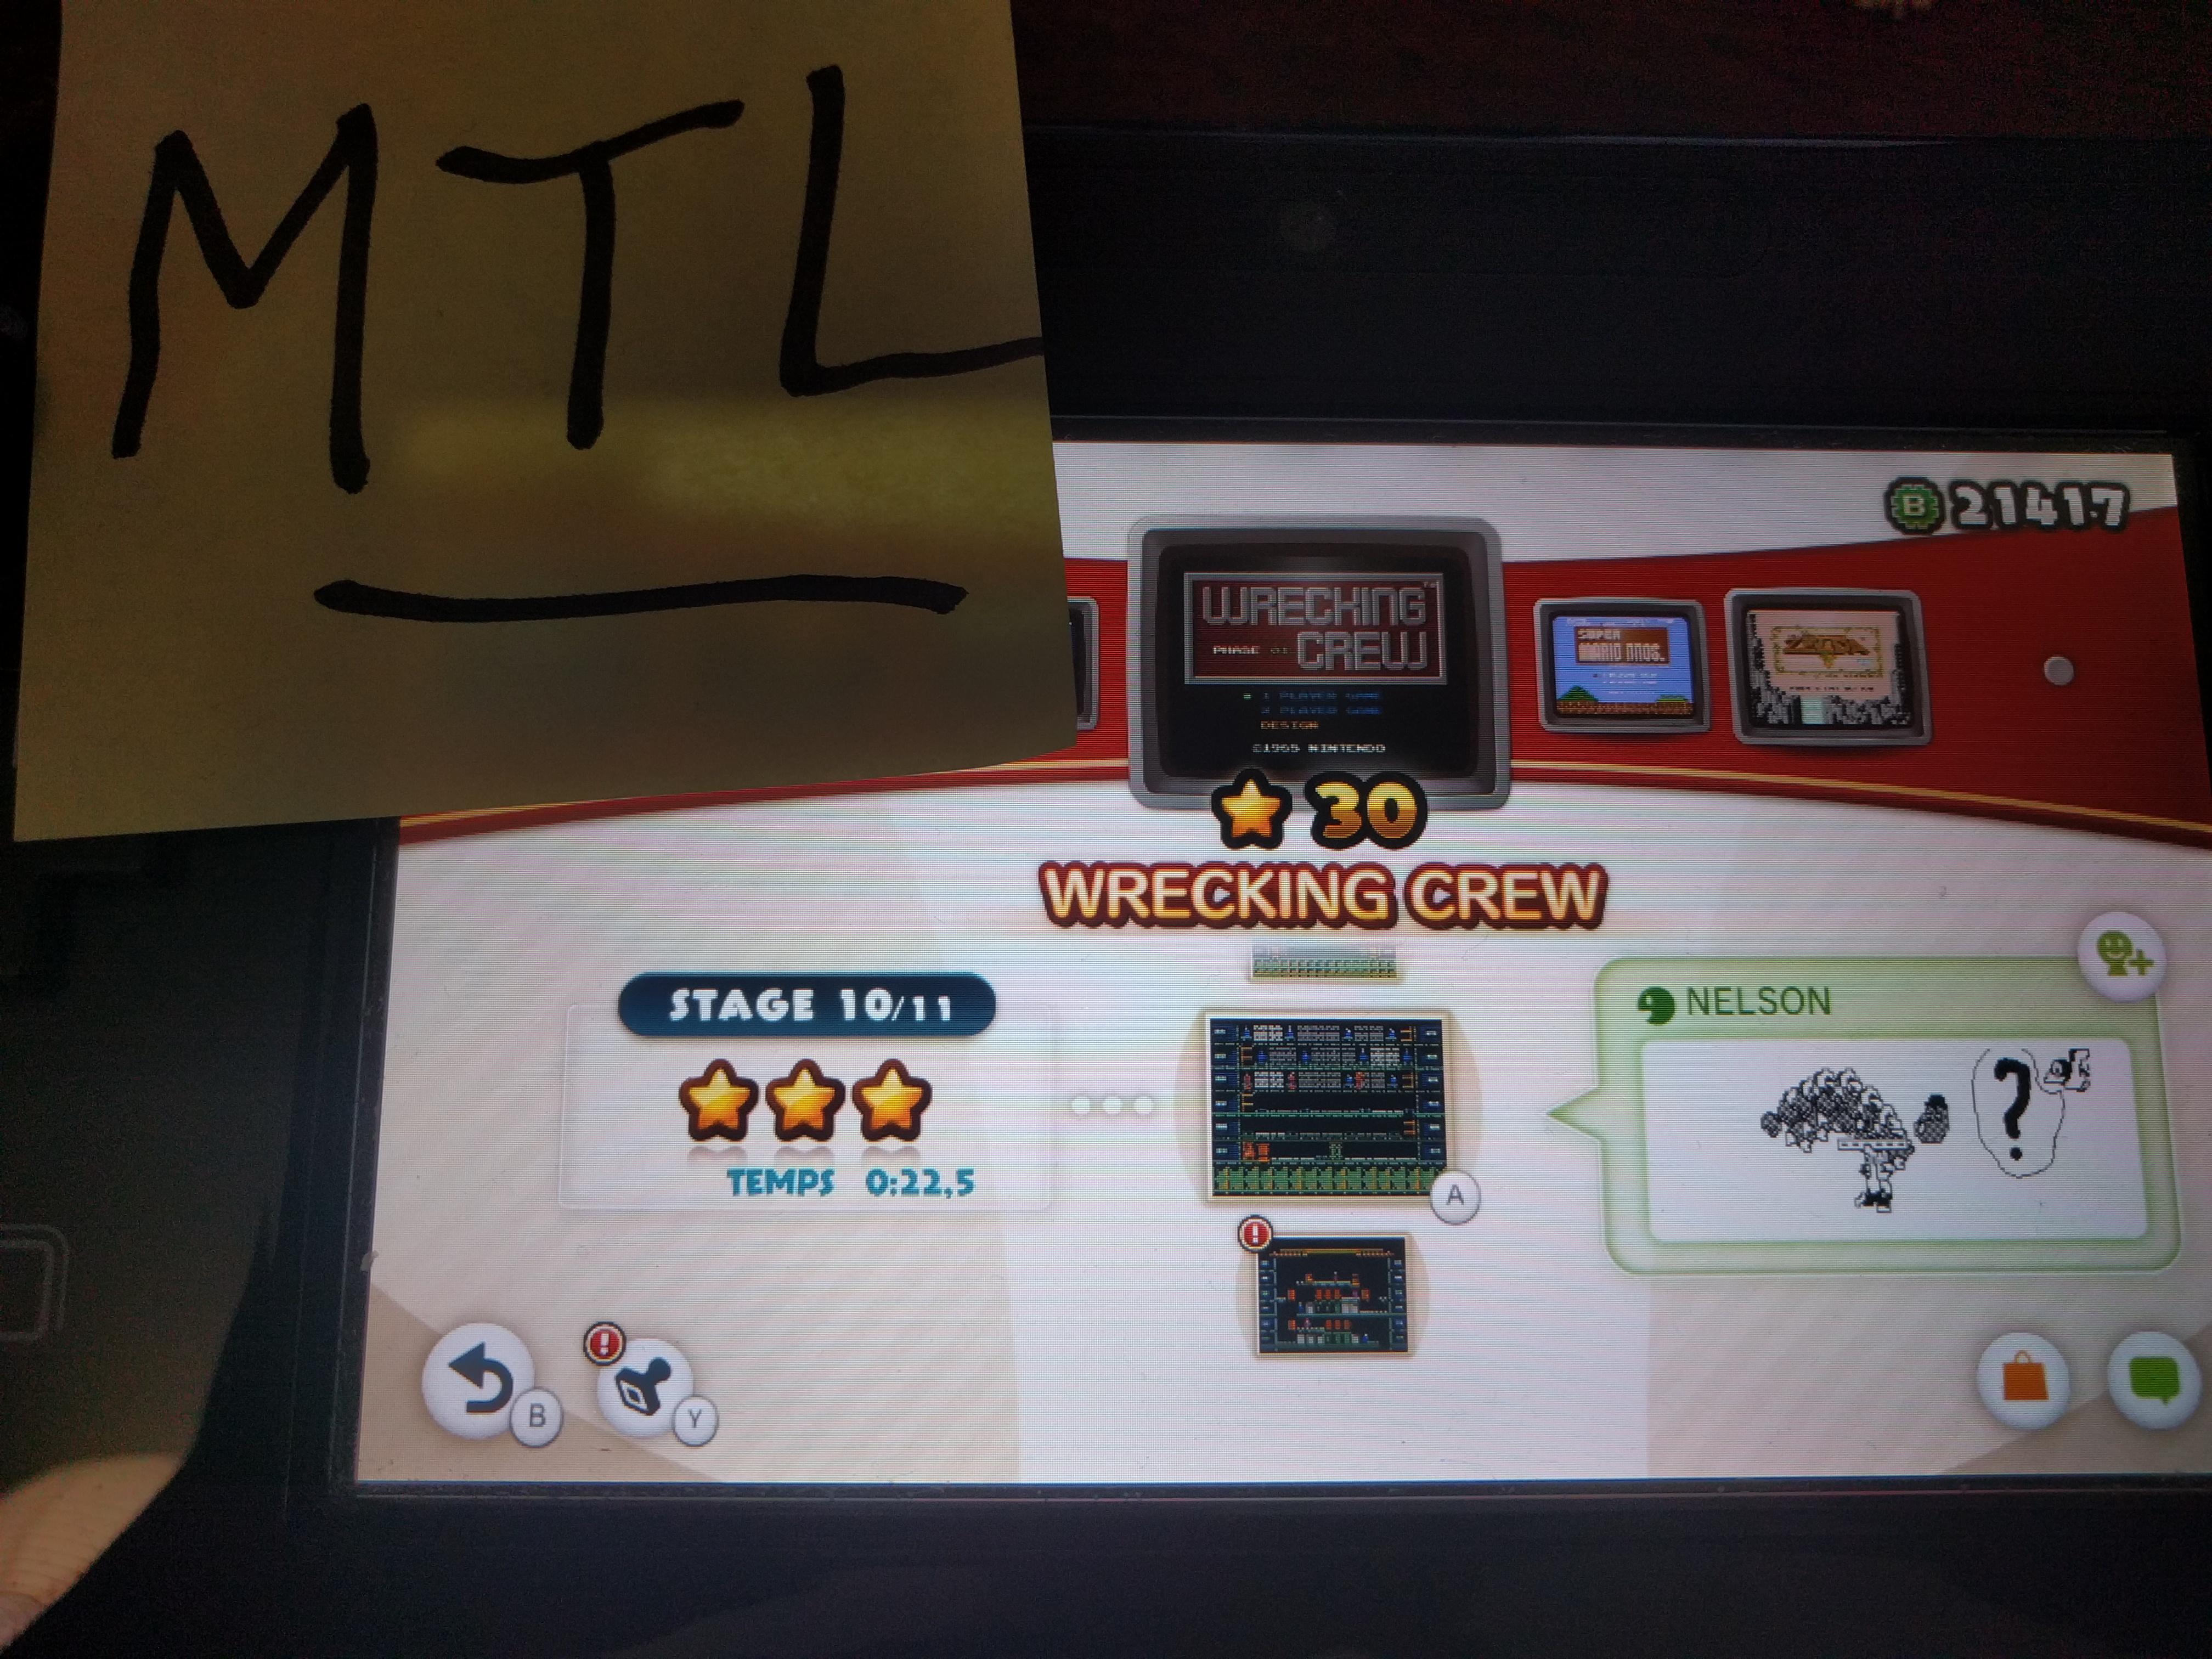 Mantalow: NES Remix: Wrecking Crew: Stage 10 (Wii U) 0:00:22.5 points on 2016-06-15 11:19:04